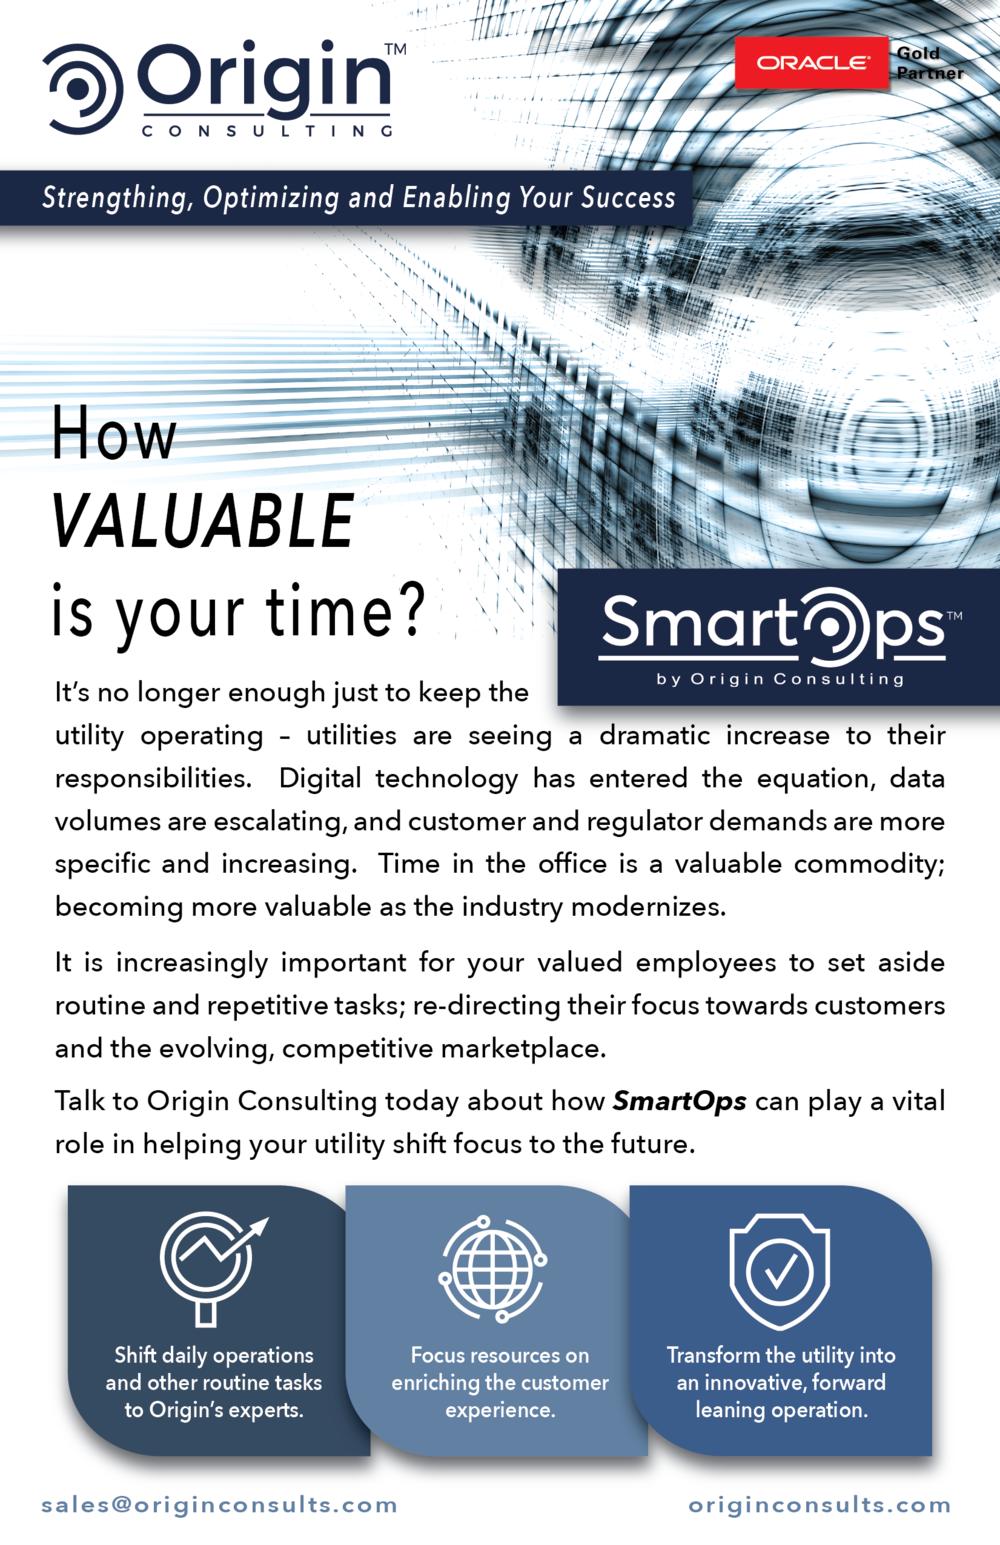 SmartOps by Origin Consulting